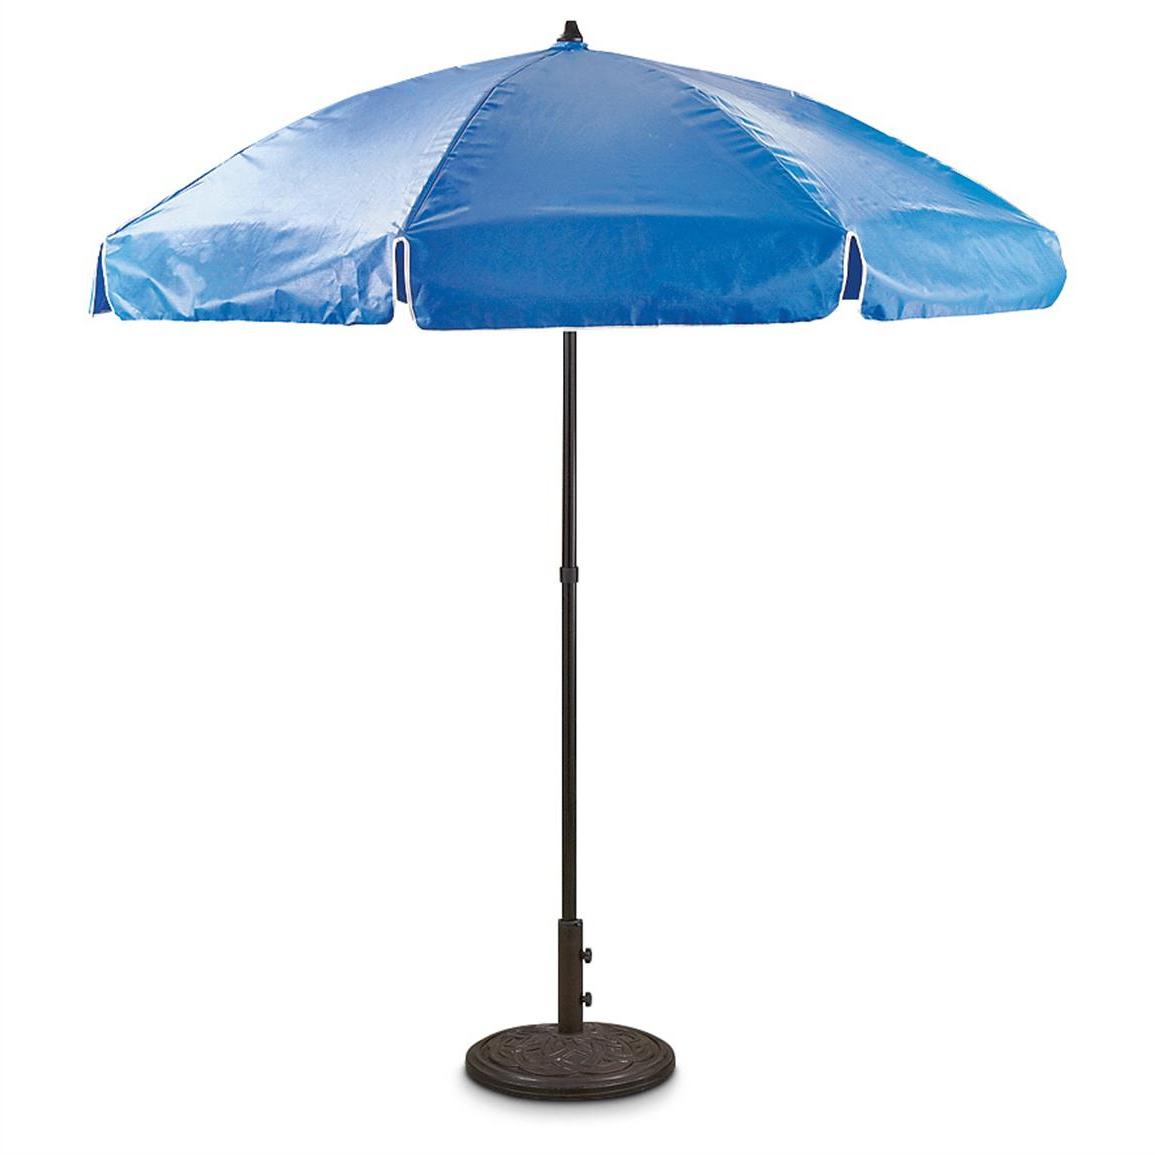 "2019 7'6"" Drape Vinyl Patio Umbrella – 635354, Patio Umbrellas At With Regard To Drape Umbrellas (View 2 of 20)"